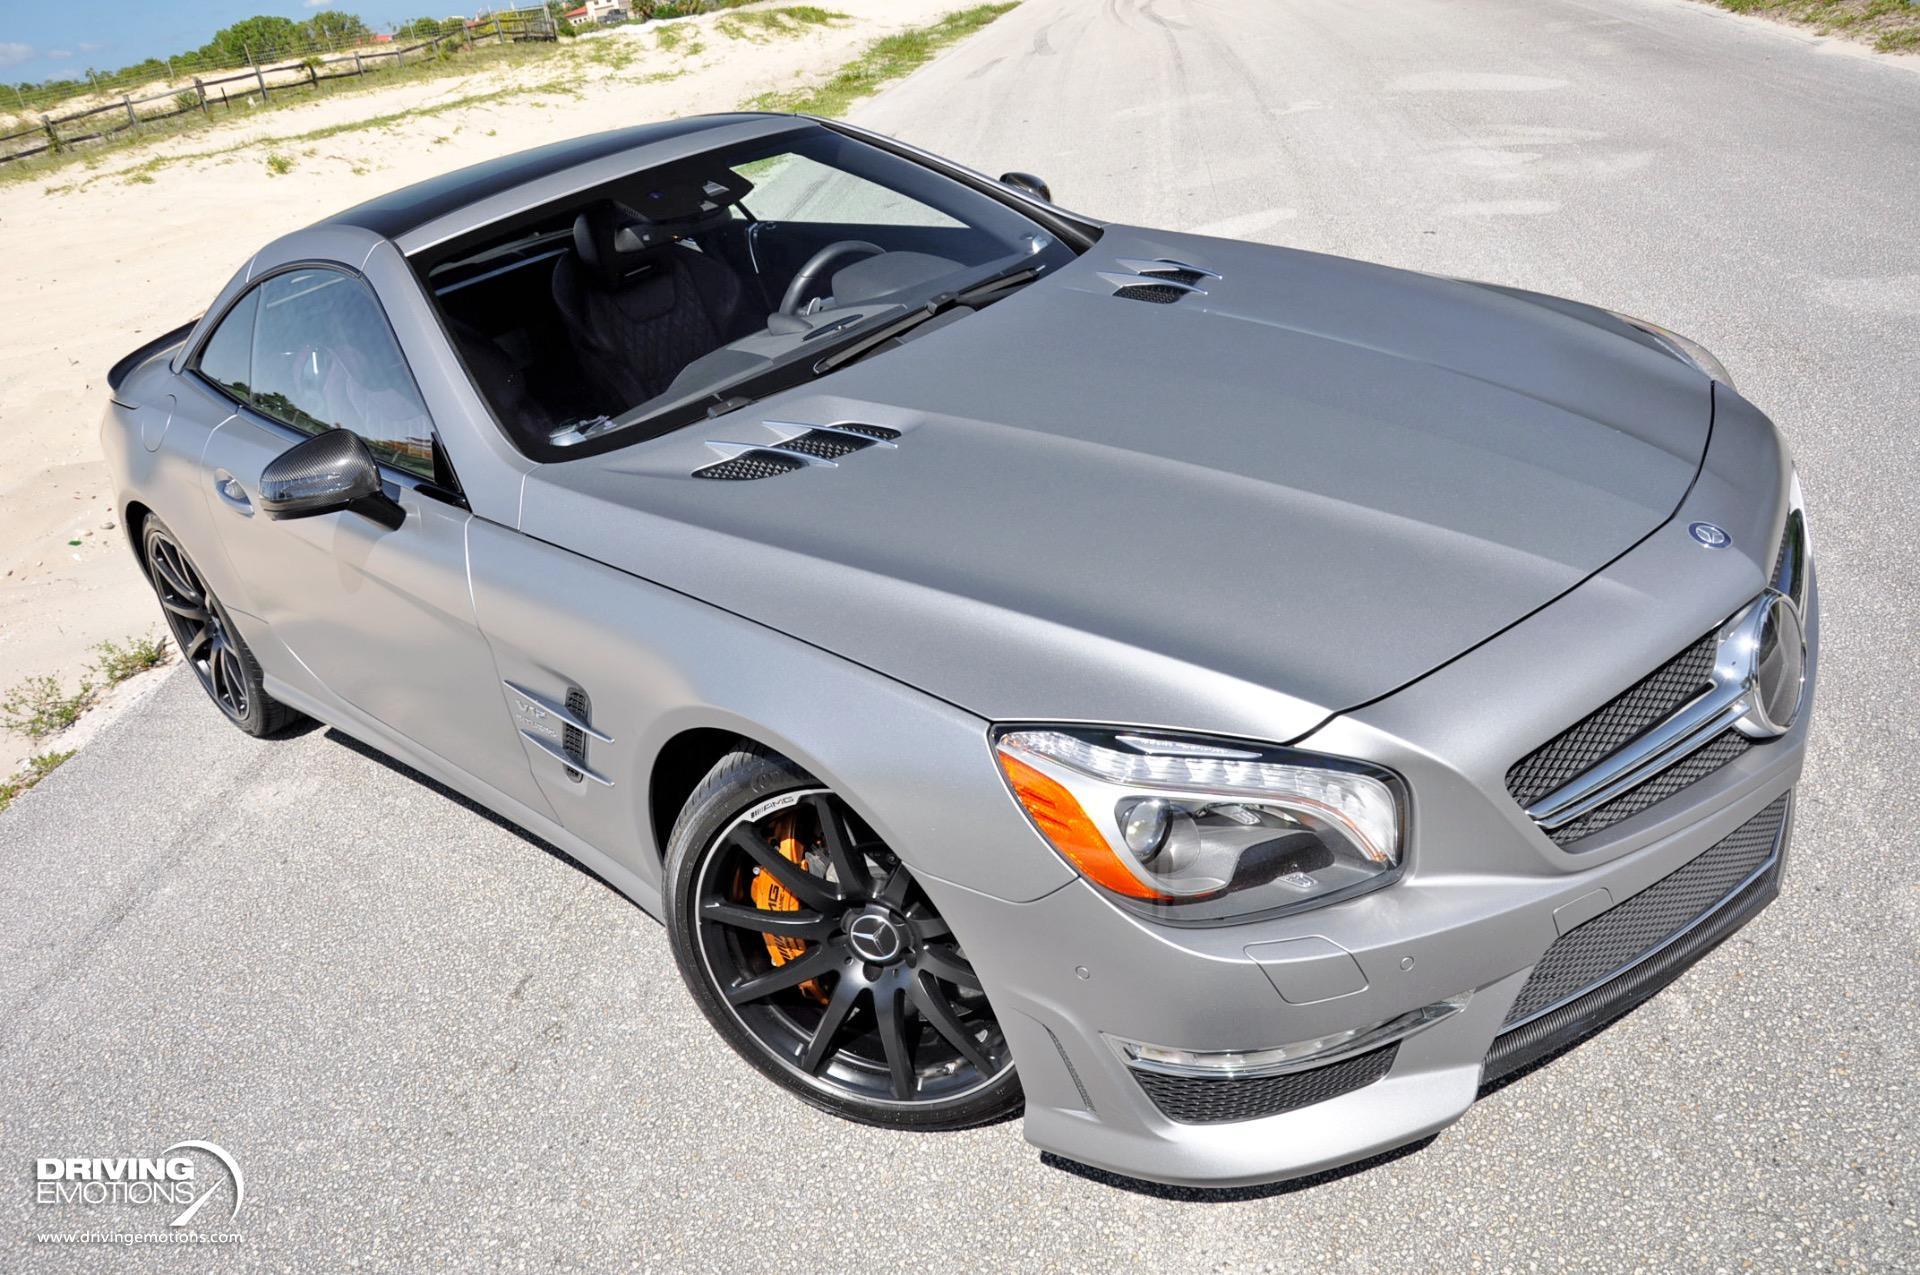 Used 2016 Mercedes-Benz SL65 AMG AMG SL 65 V12 Bi Turbo $239k MSRP! | Lake Park, FL